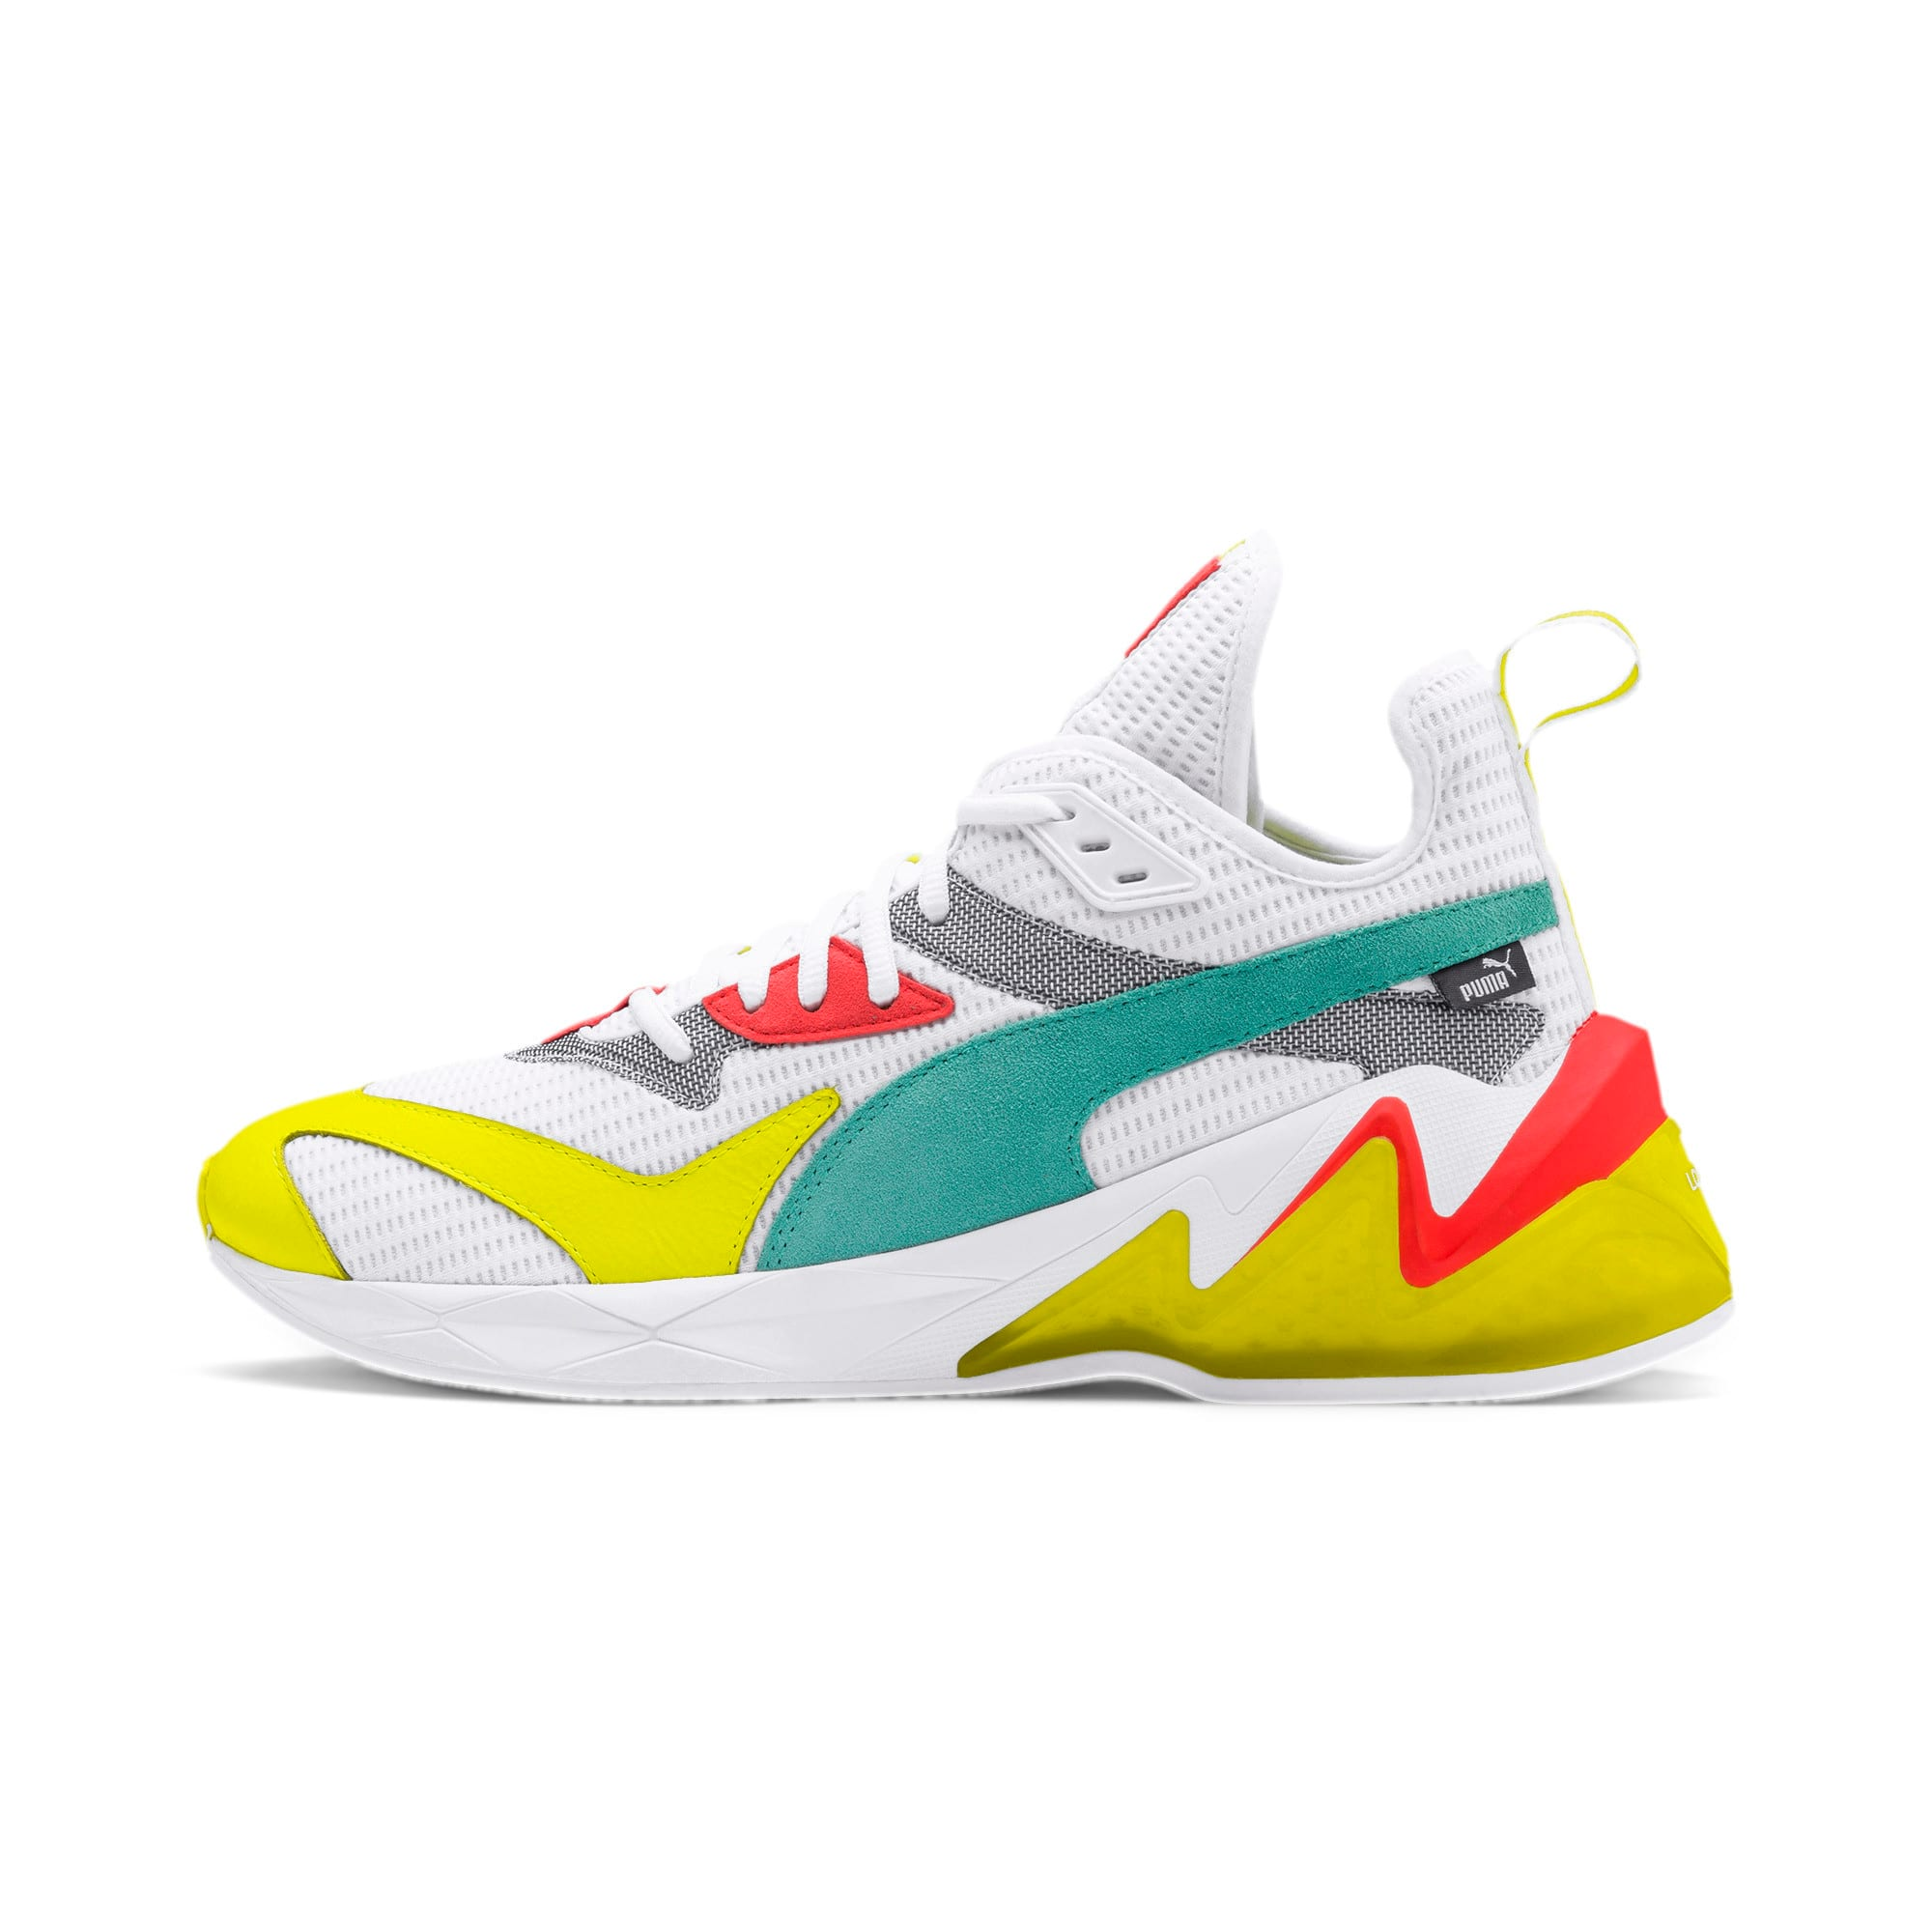 Thumbnail 1 of LQDCELL Origin Men's Shoes, Puma White-Yellow Alert, medium